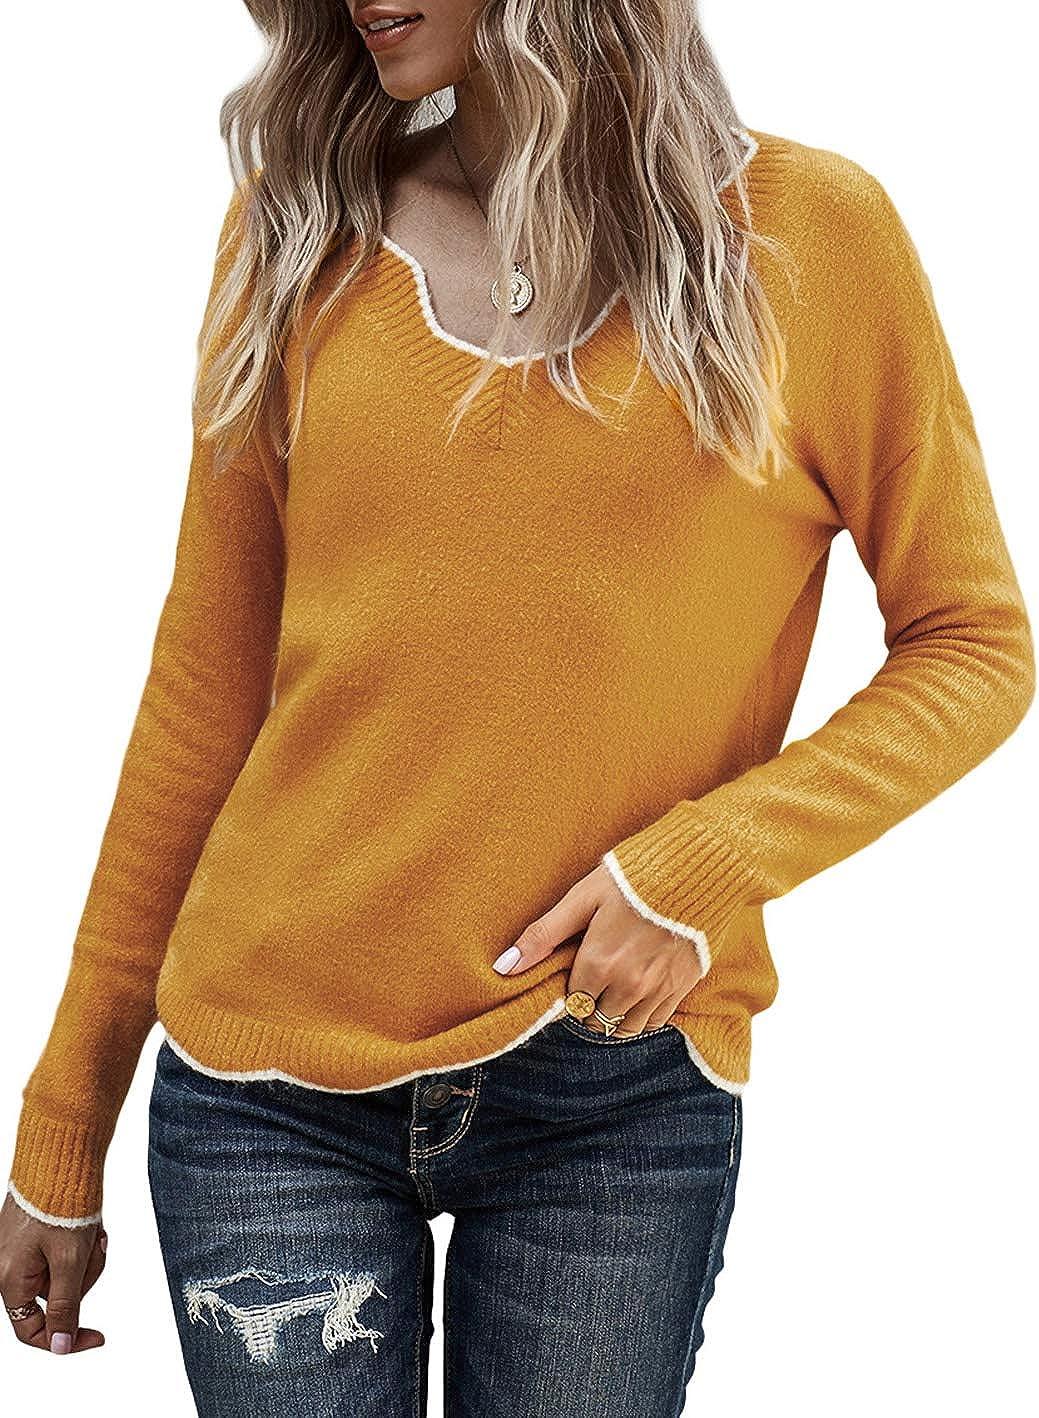 Women's Casual Wavy V Neck Long Sleeve Lightweight Pullover Knit Sweater Jumper Tops